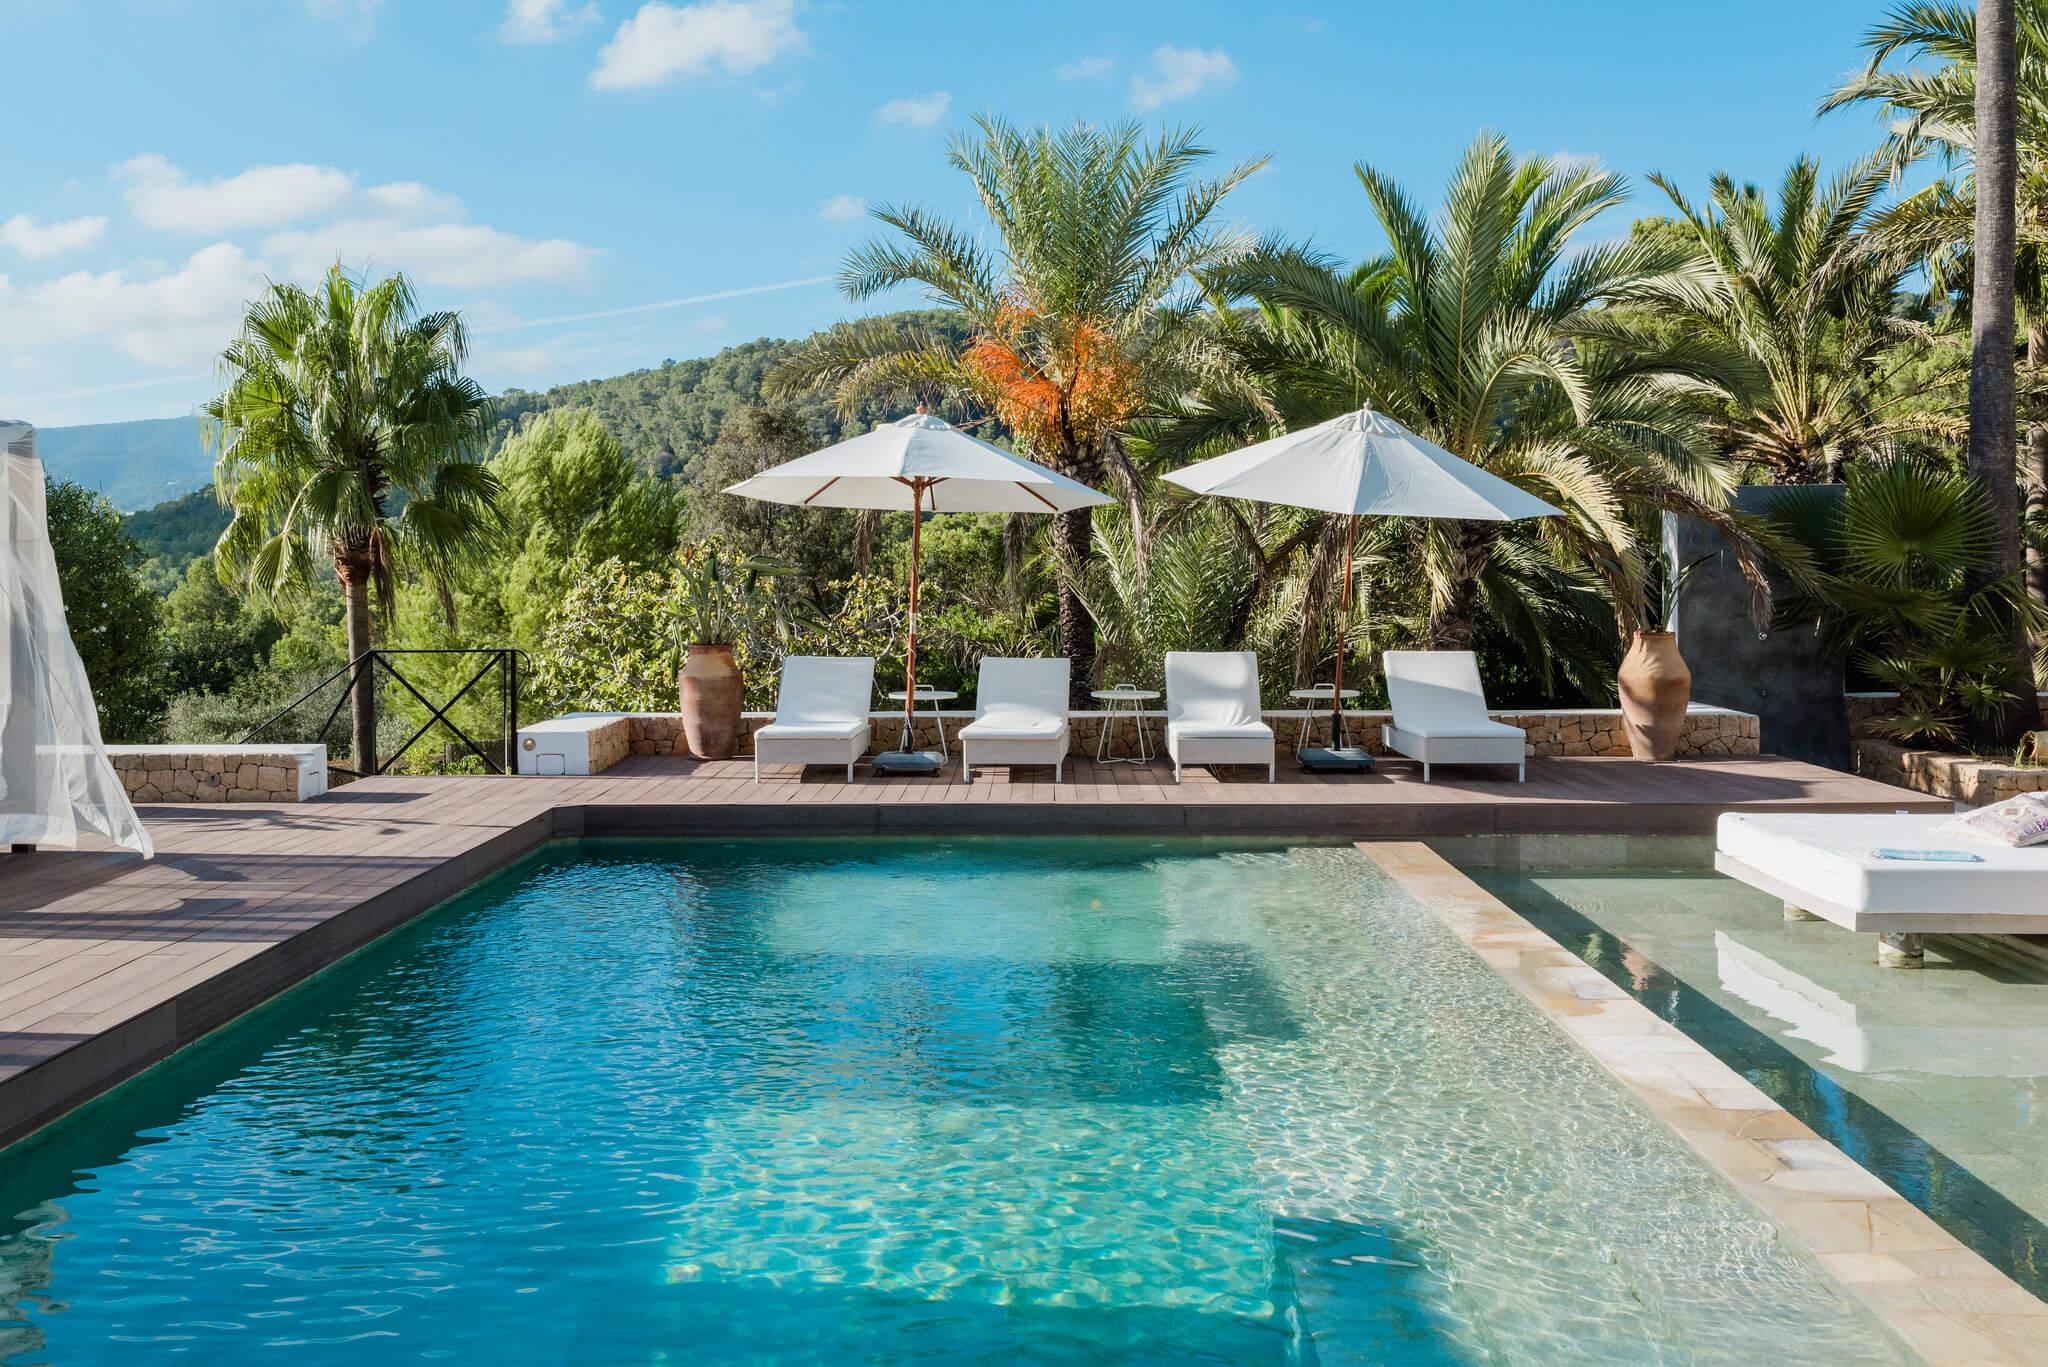 https://www.white-ibiza.com/wp-content/uploads/2020/05/white-ibiza-villas-casa-amalia-exterior-sunloungers.jpg